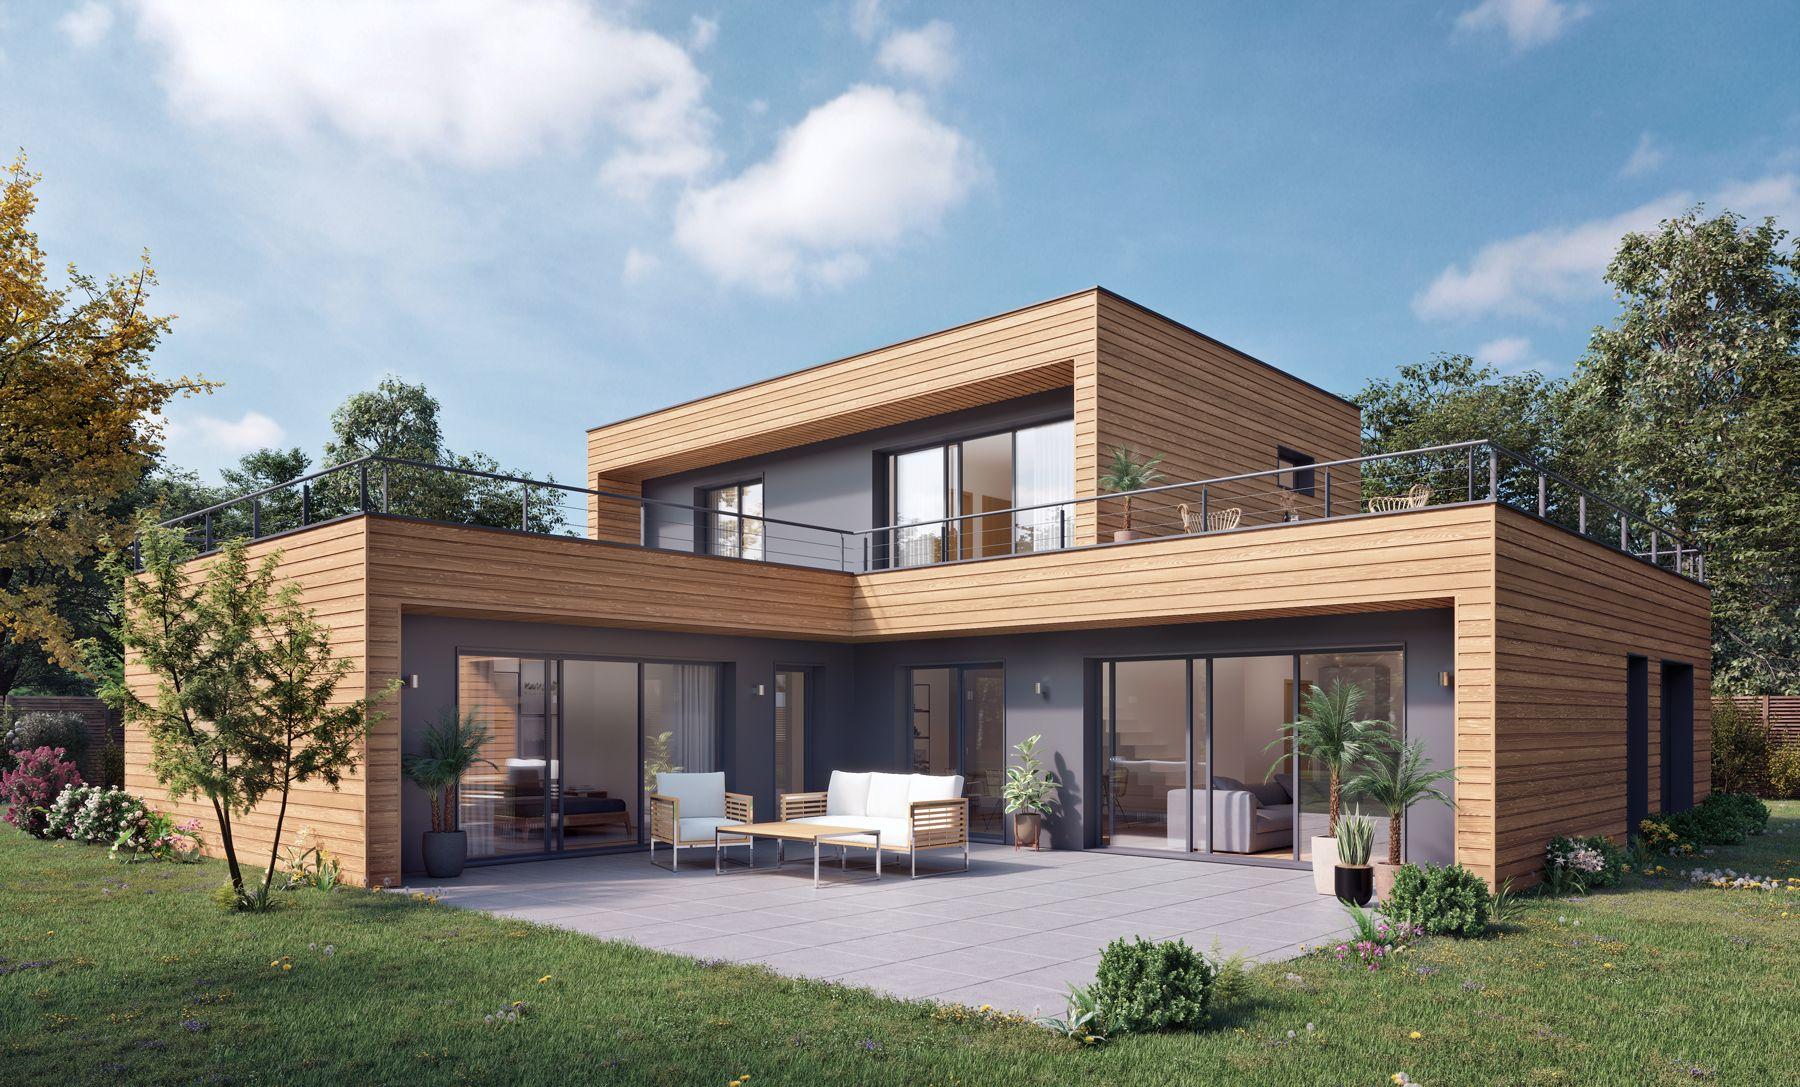 Inspiration NOOV   Minimalist house design, Home building design ...